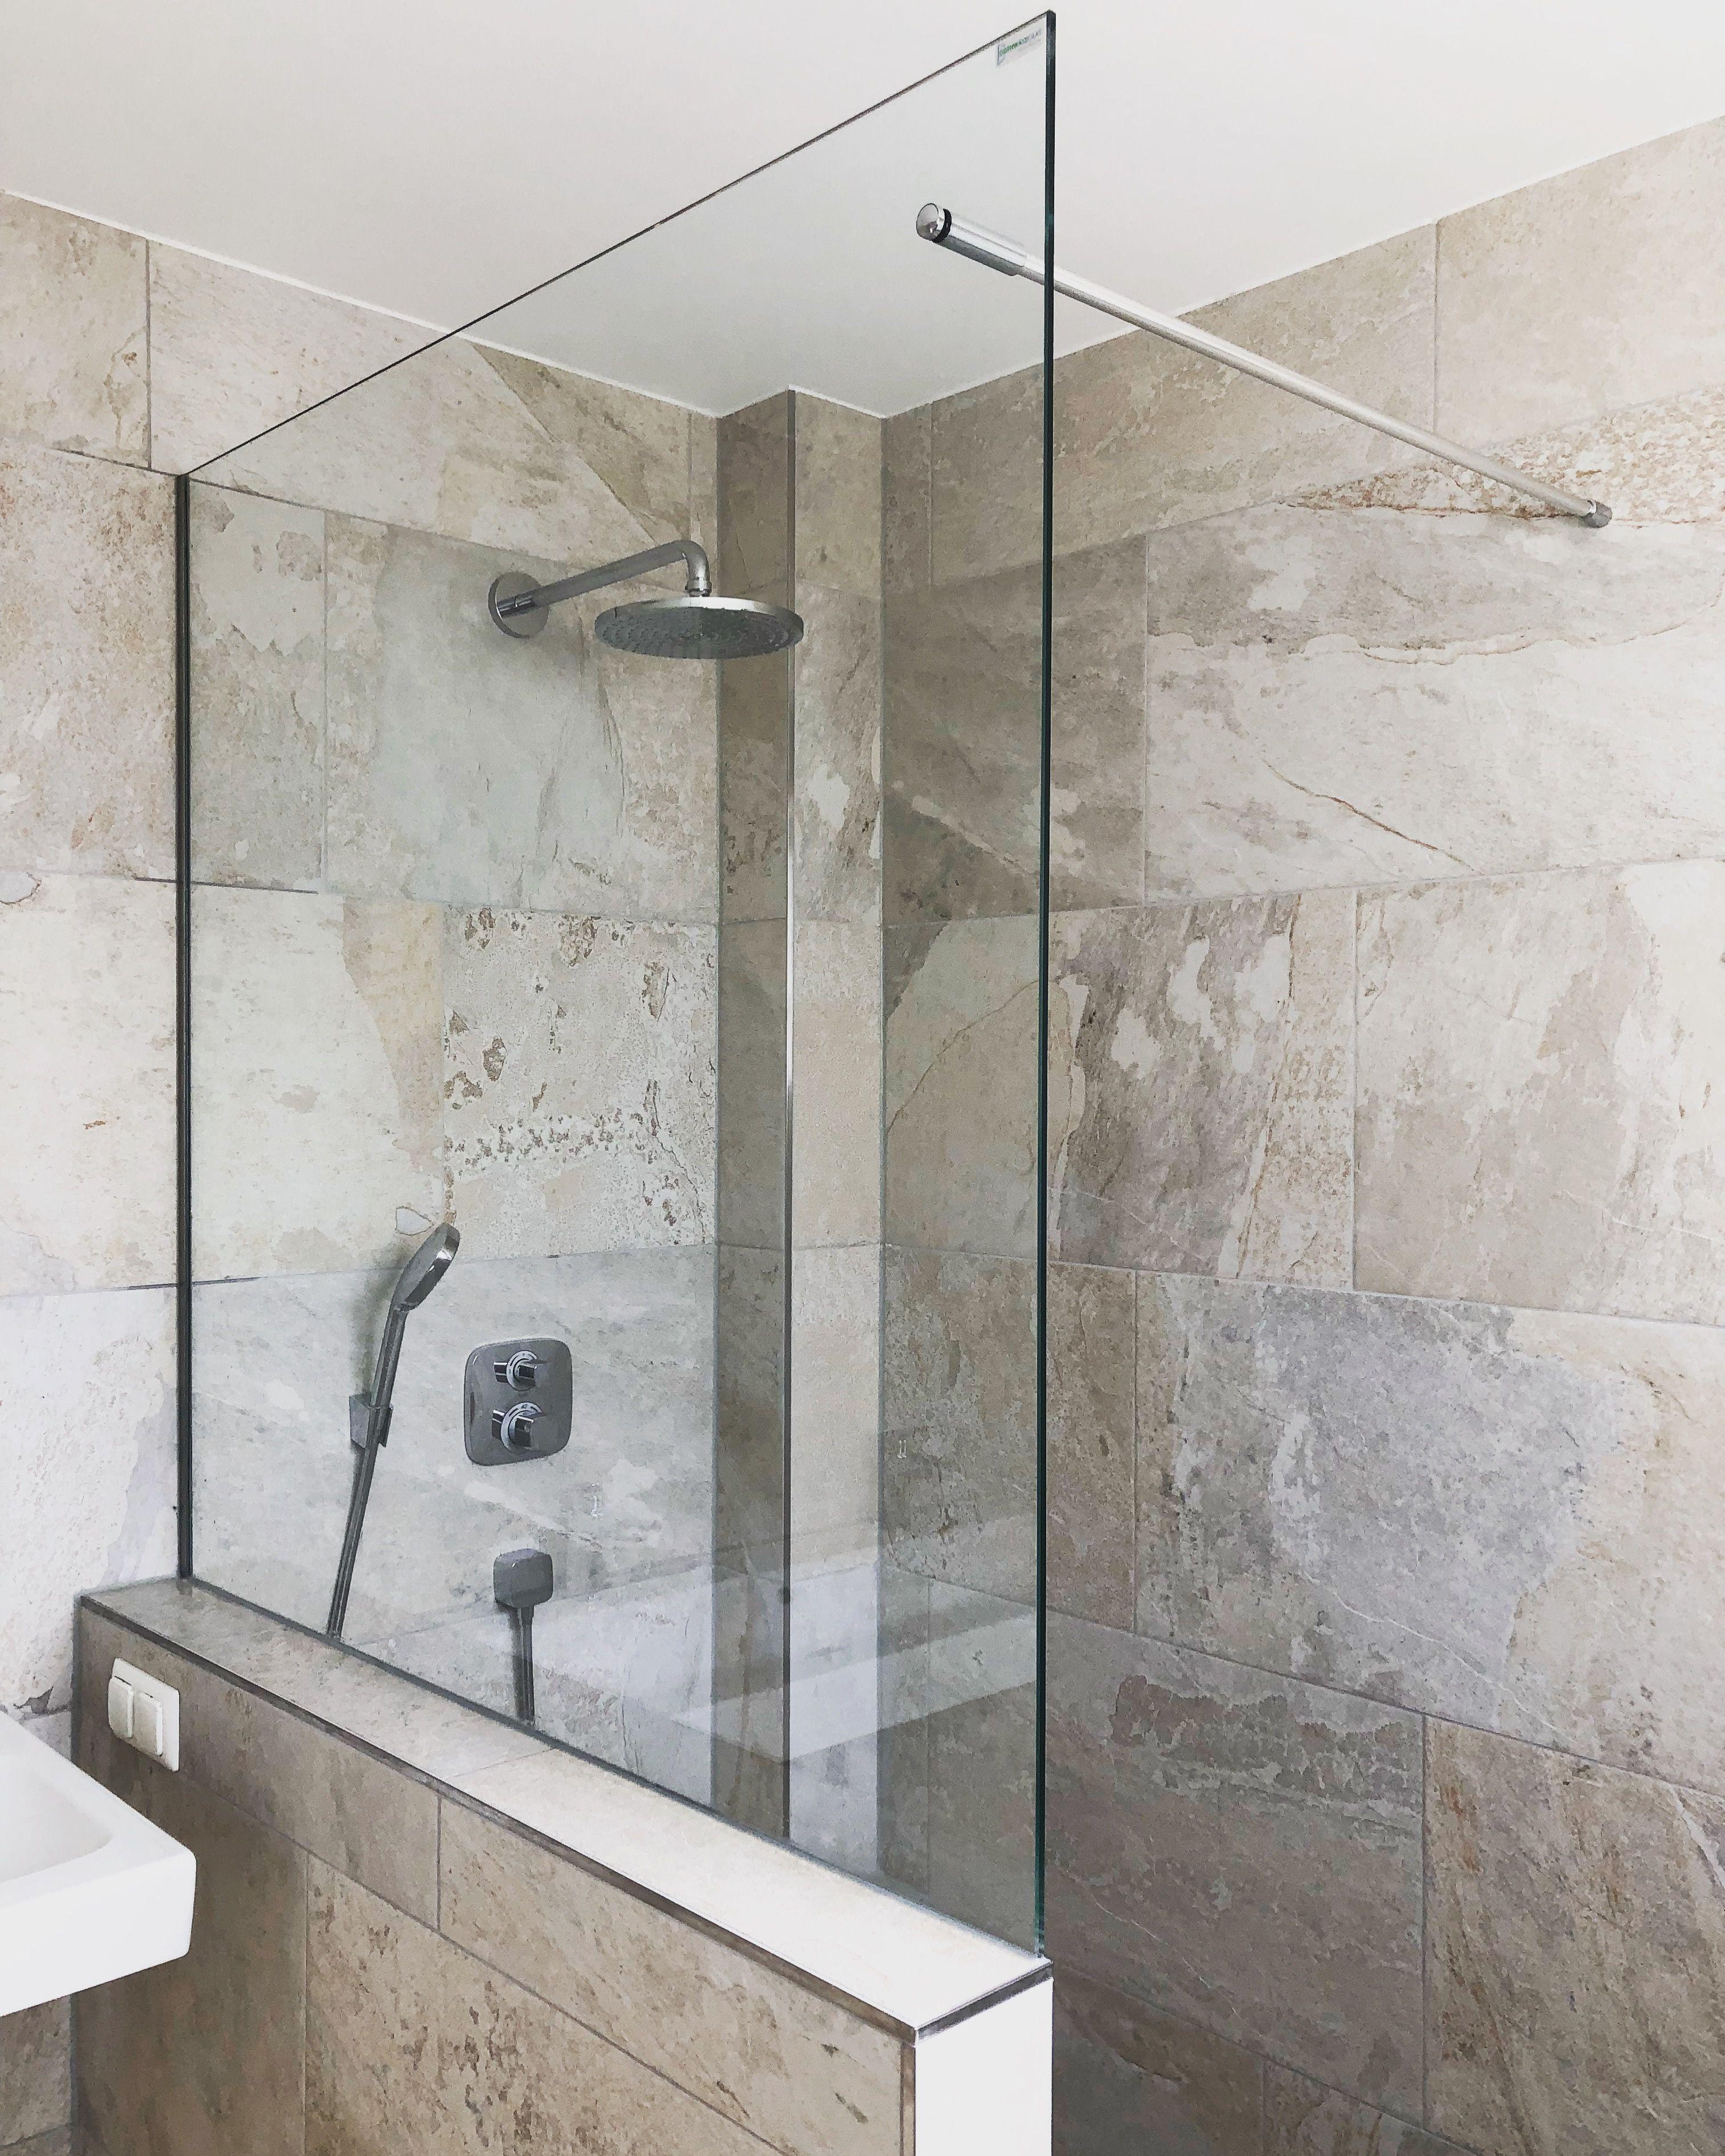 Badezimmer Dusche Mauer